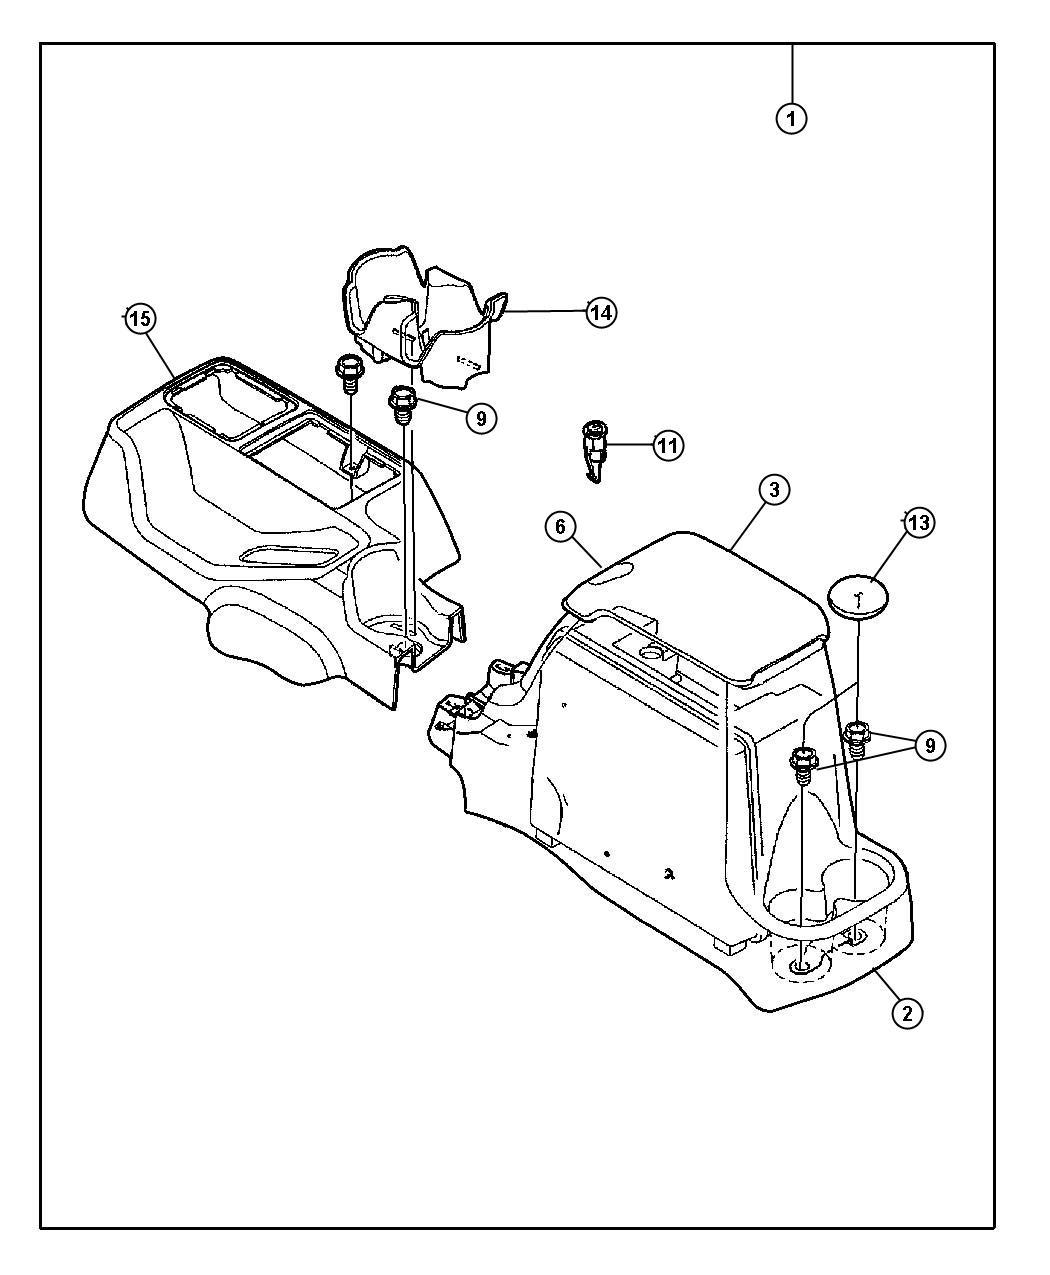 Jeep Wrangler Lid. Center console storage. [dv], gray